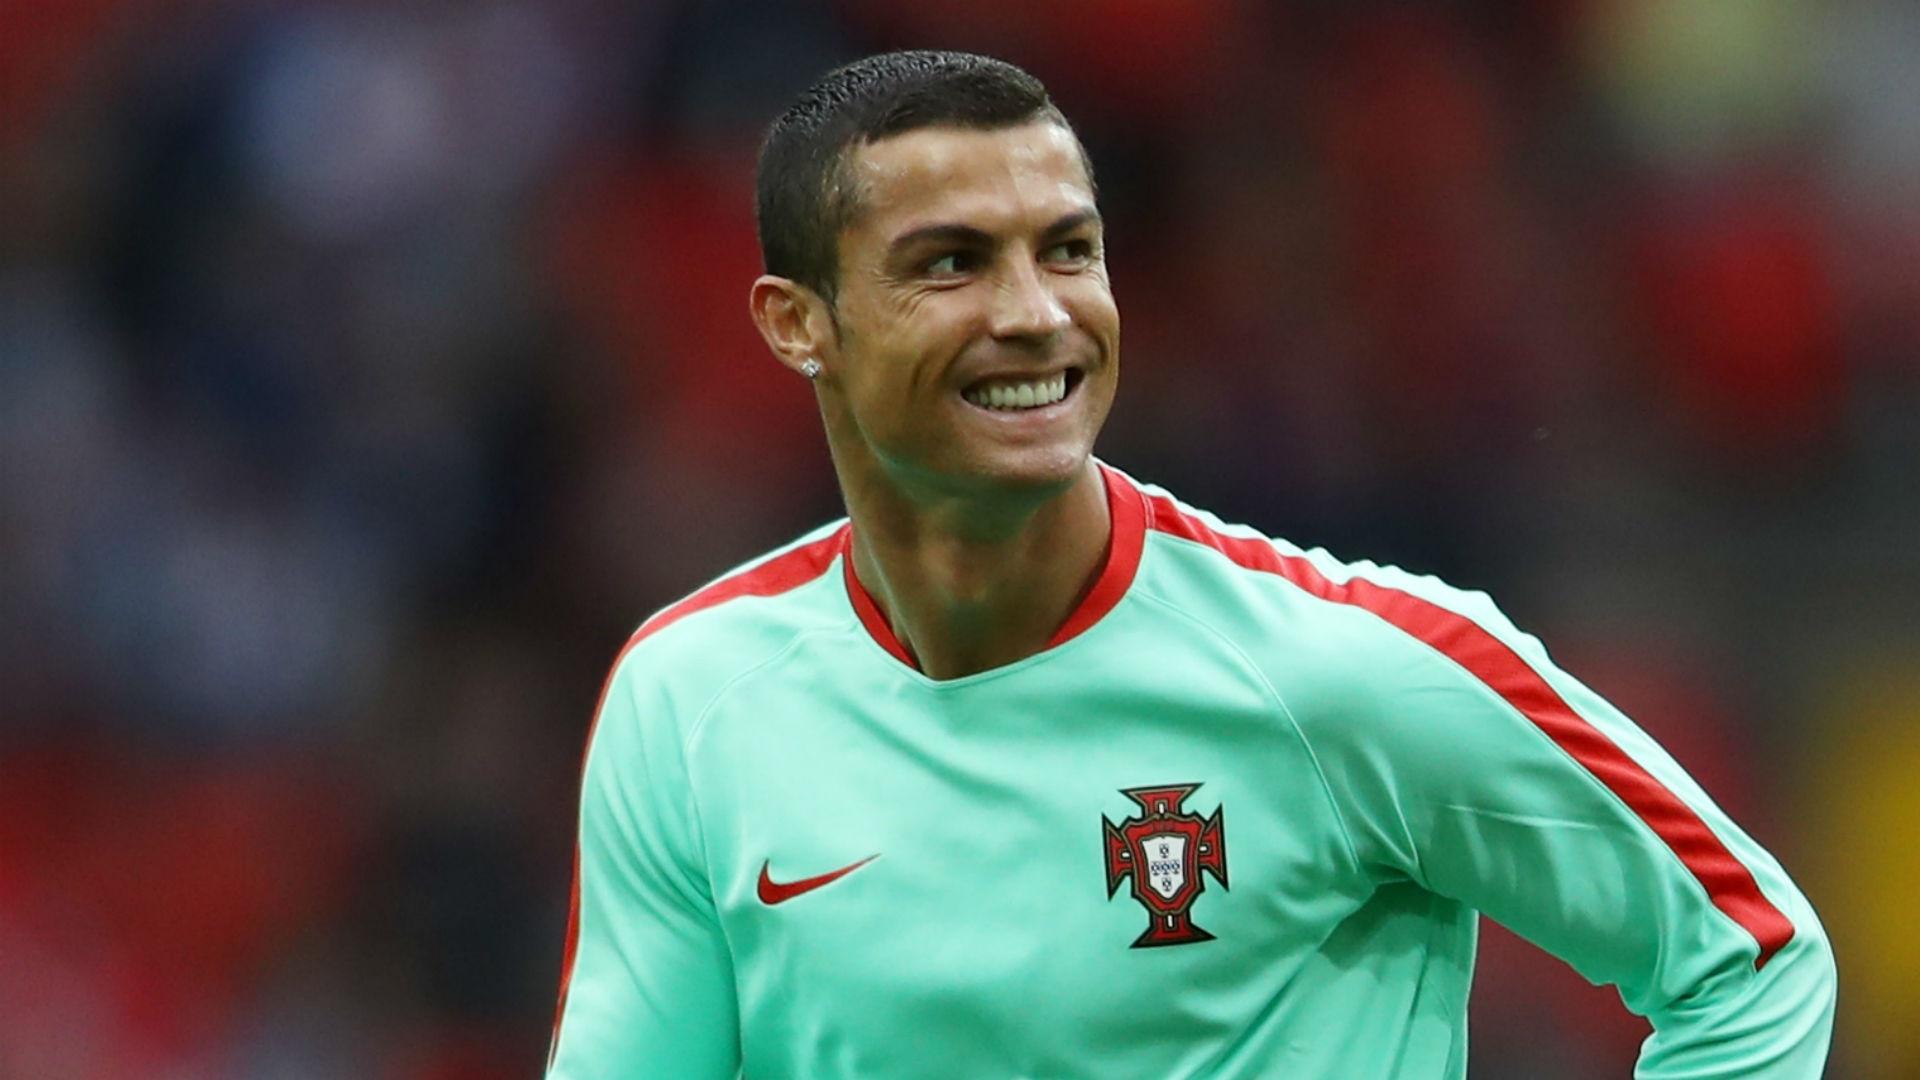 Cristiano Ronaldo (Real Madrid) - Portugal